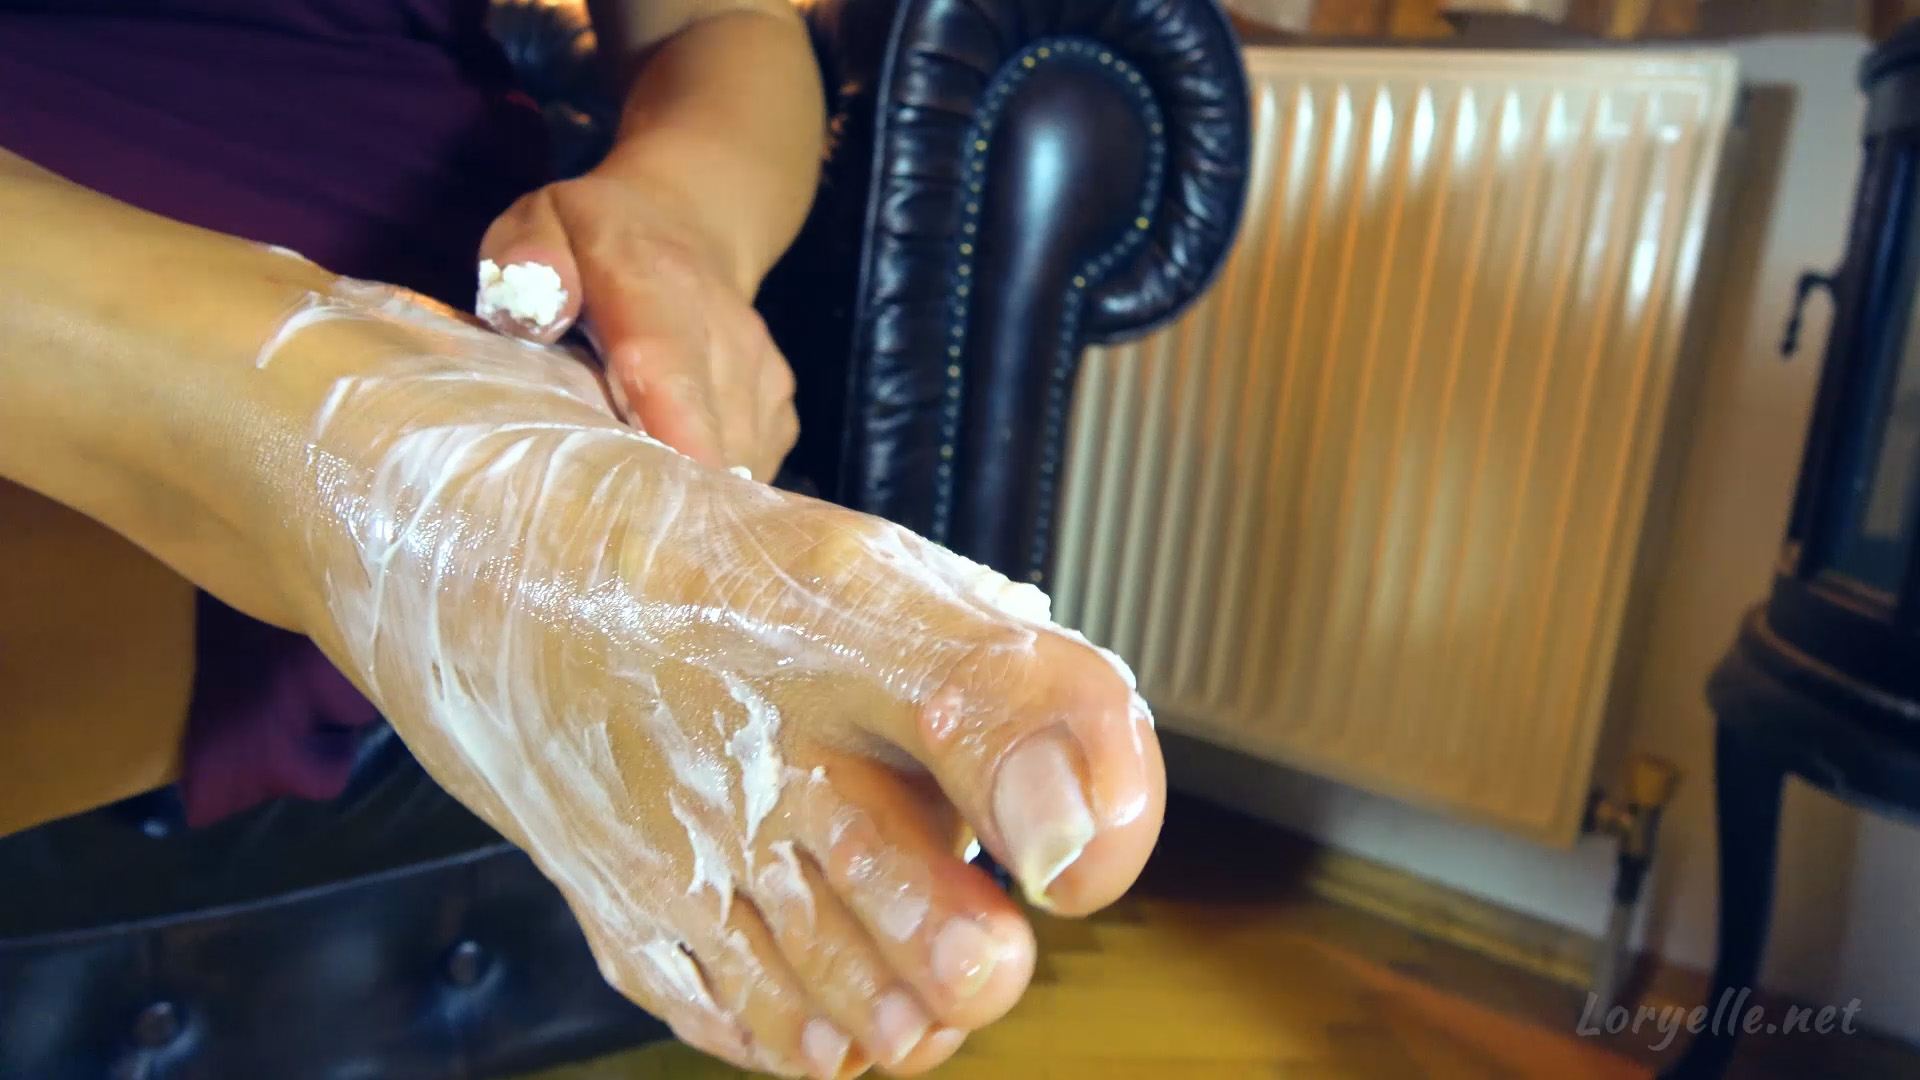 Loryelle Creamy Massage Foot Fetish Wet Messy